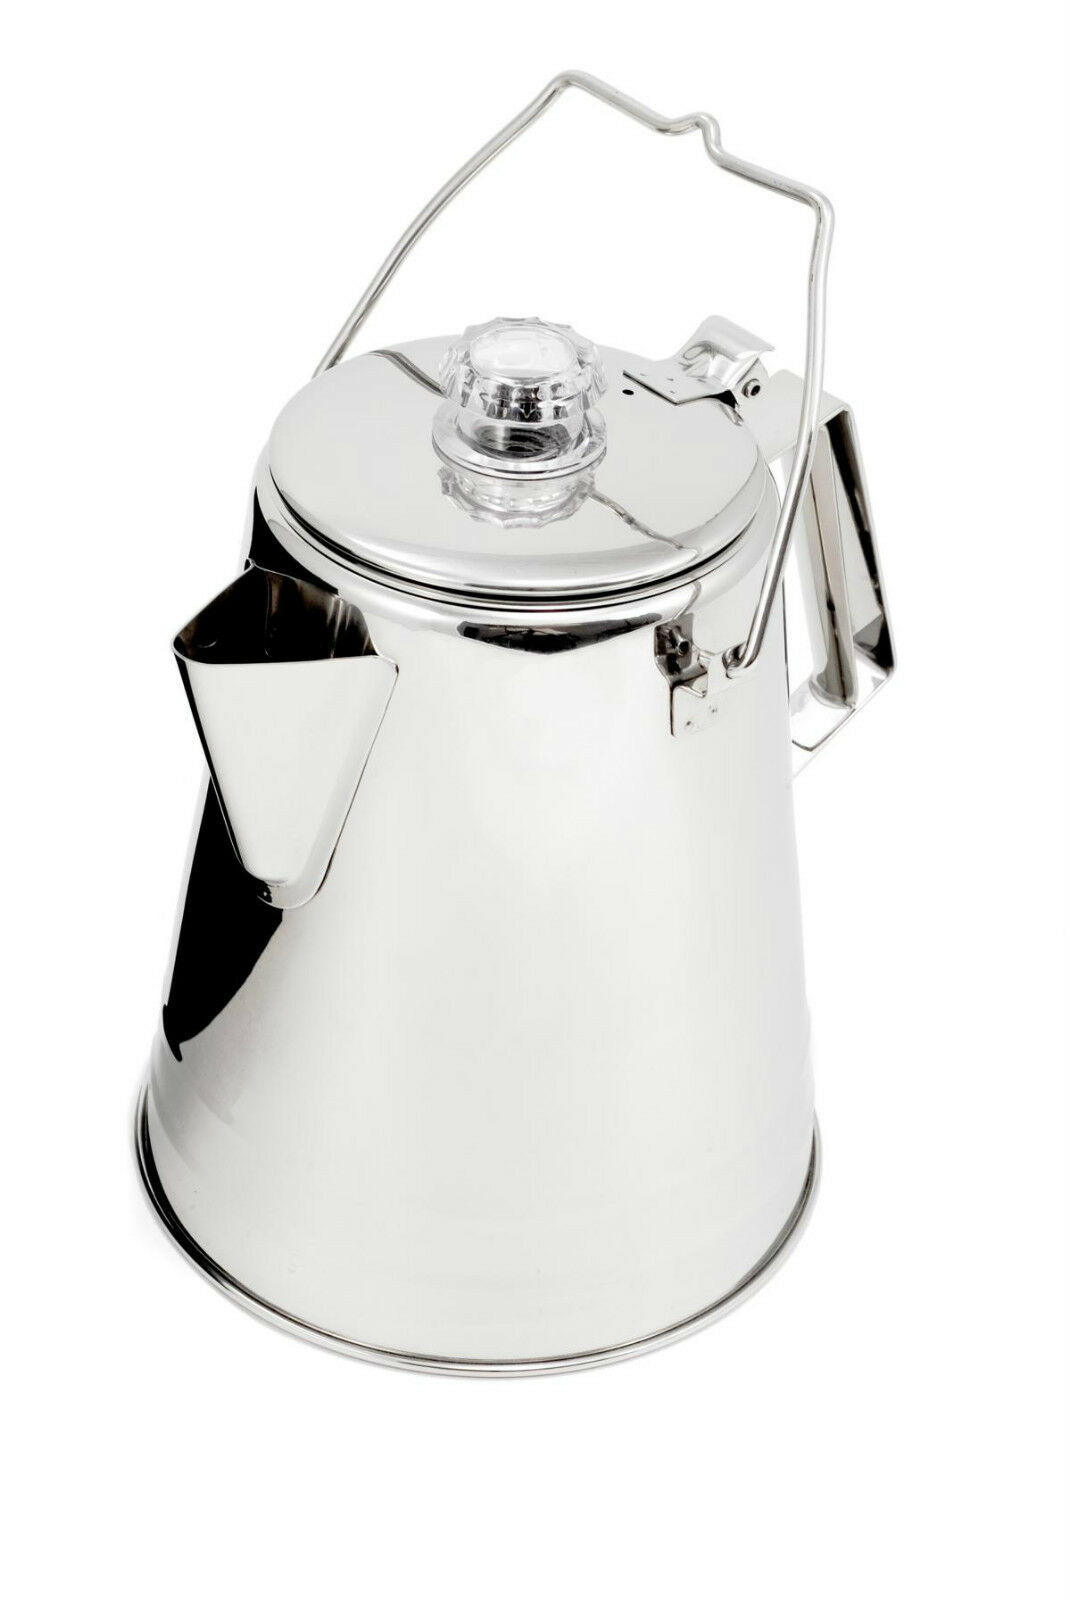 Gsi de plein airs-Edelstahl-perkolator coffee - the four Tailles nouveau